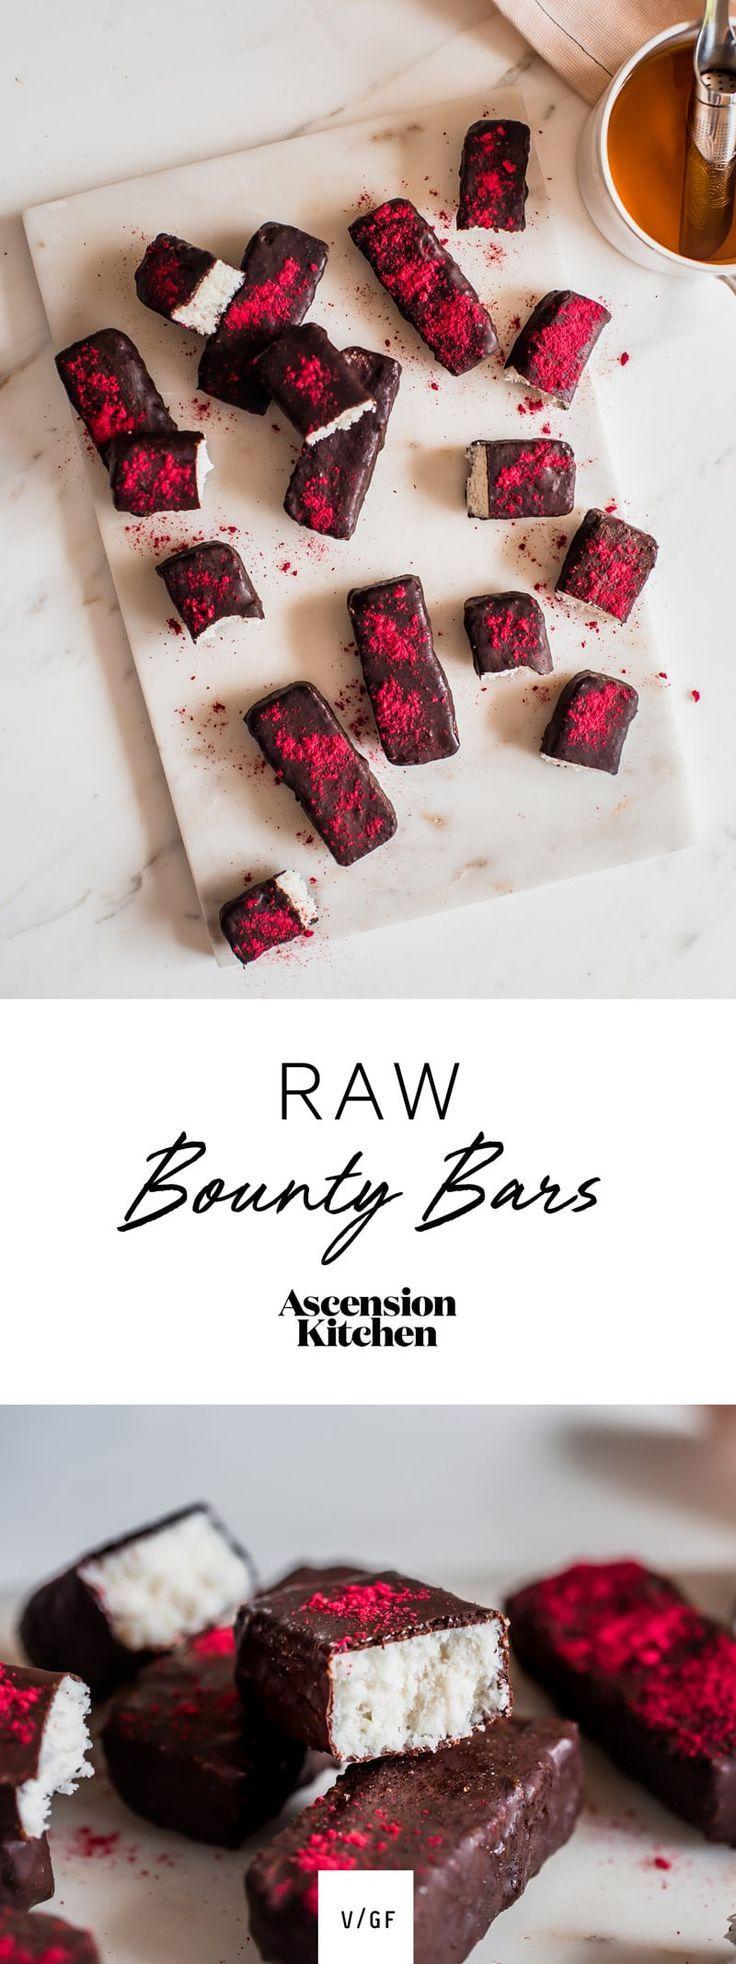 183 best Raw Food Recipes images on Pinterest   Vegan recipes, Drink ...